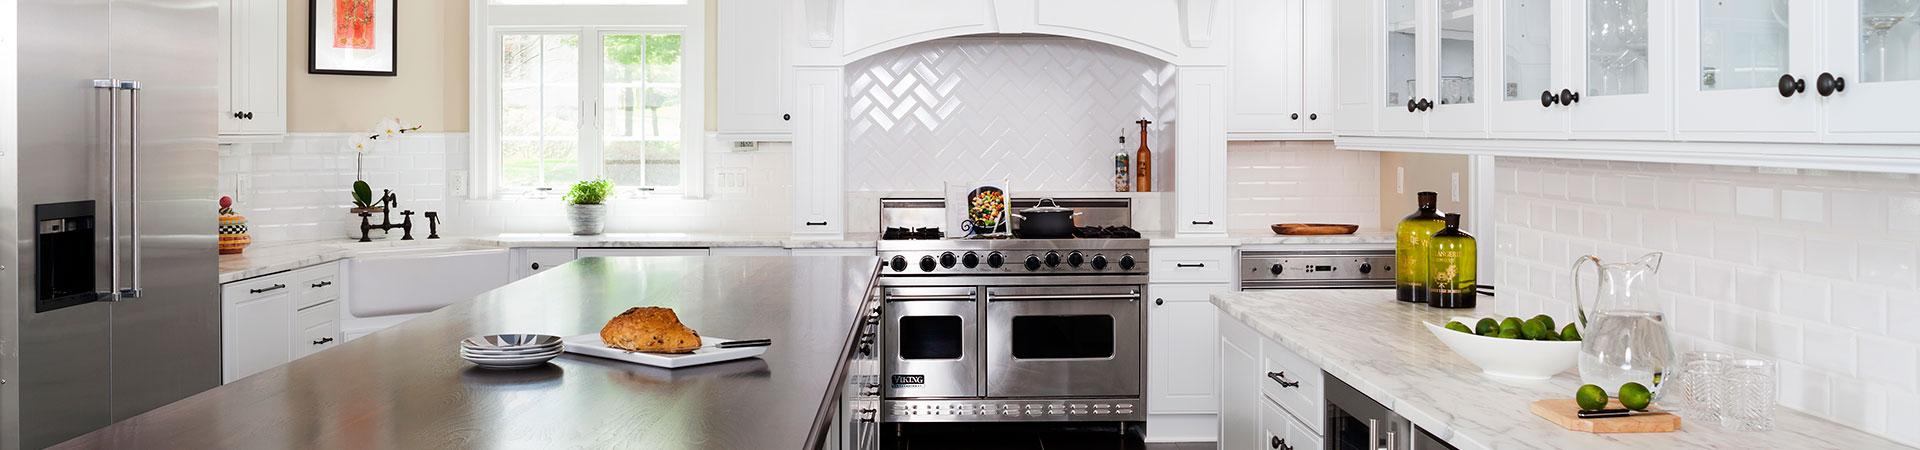 Kitchen remodeling in Washington DC, MD, Northern VA